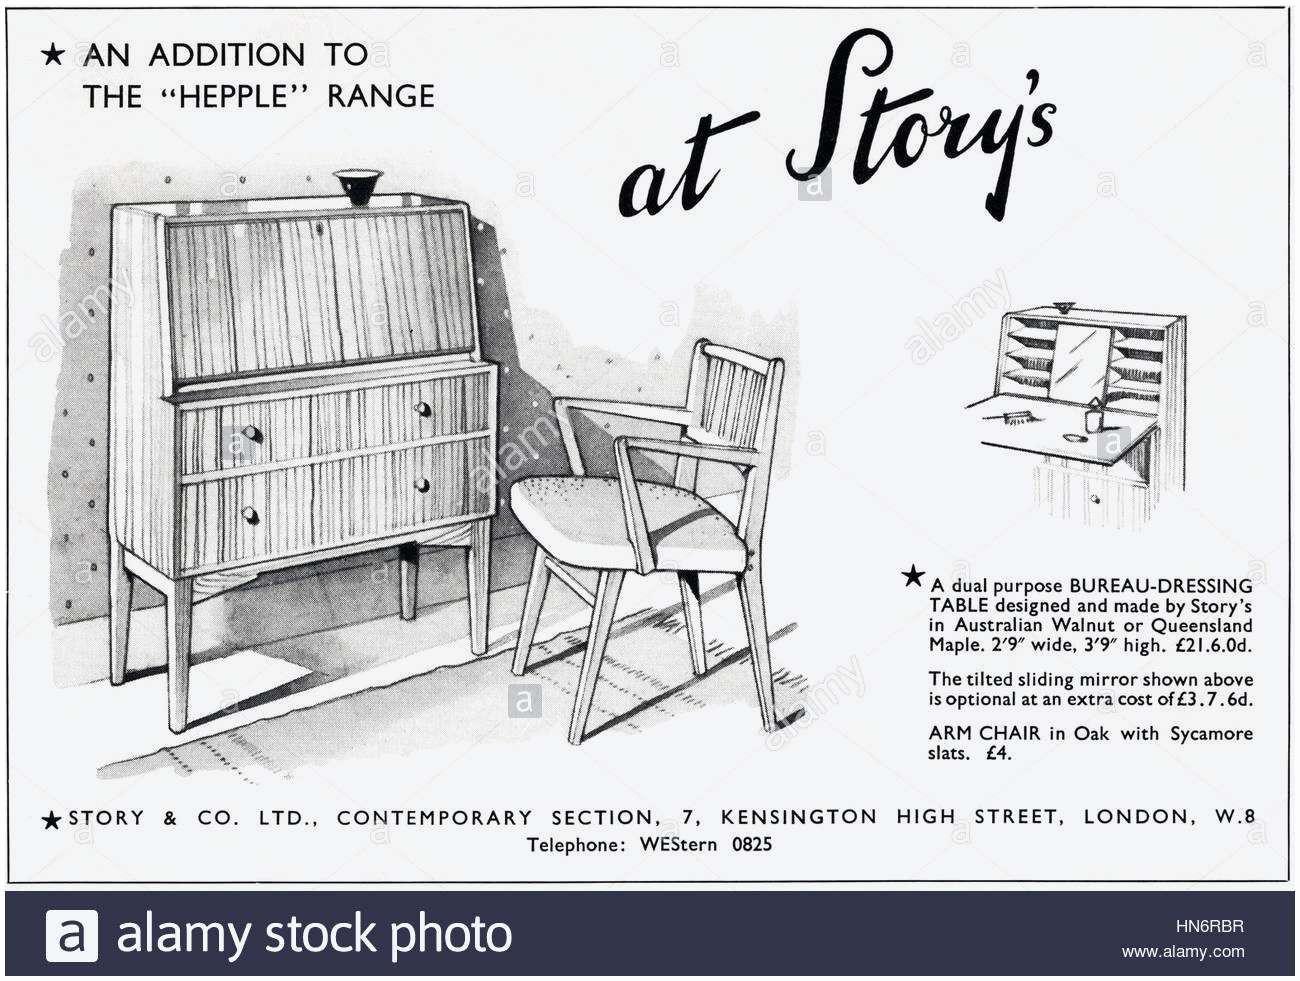 table jardin brico depot elegant meuble en belgique mobilier de jardin en belgique ou brico depot of table jardin brico depot